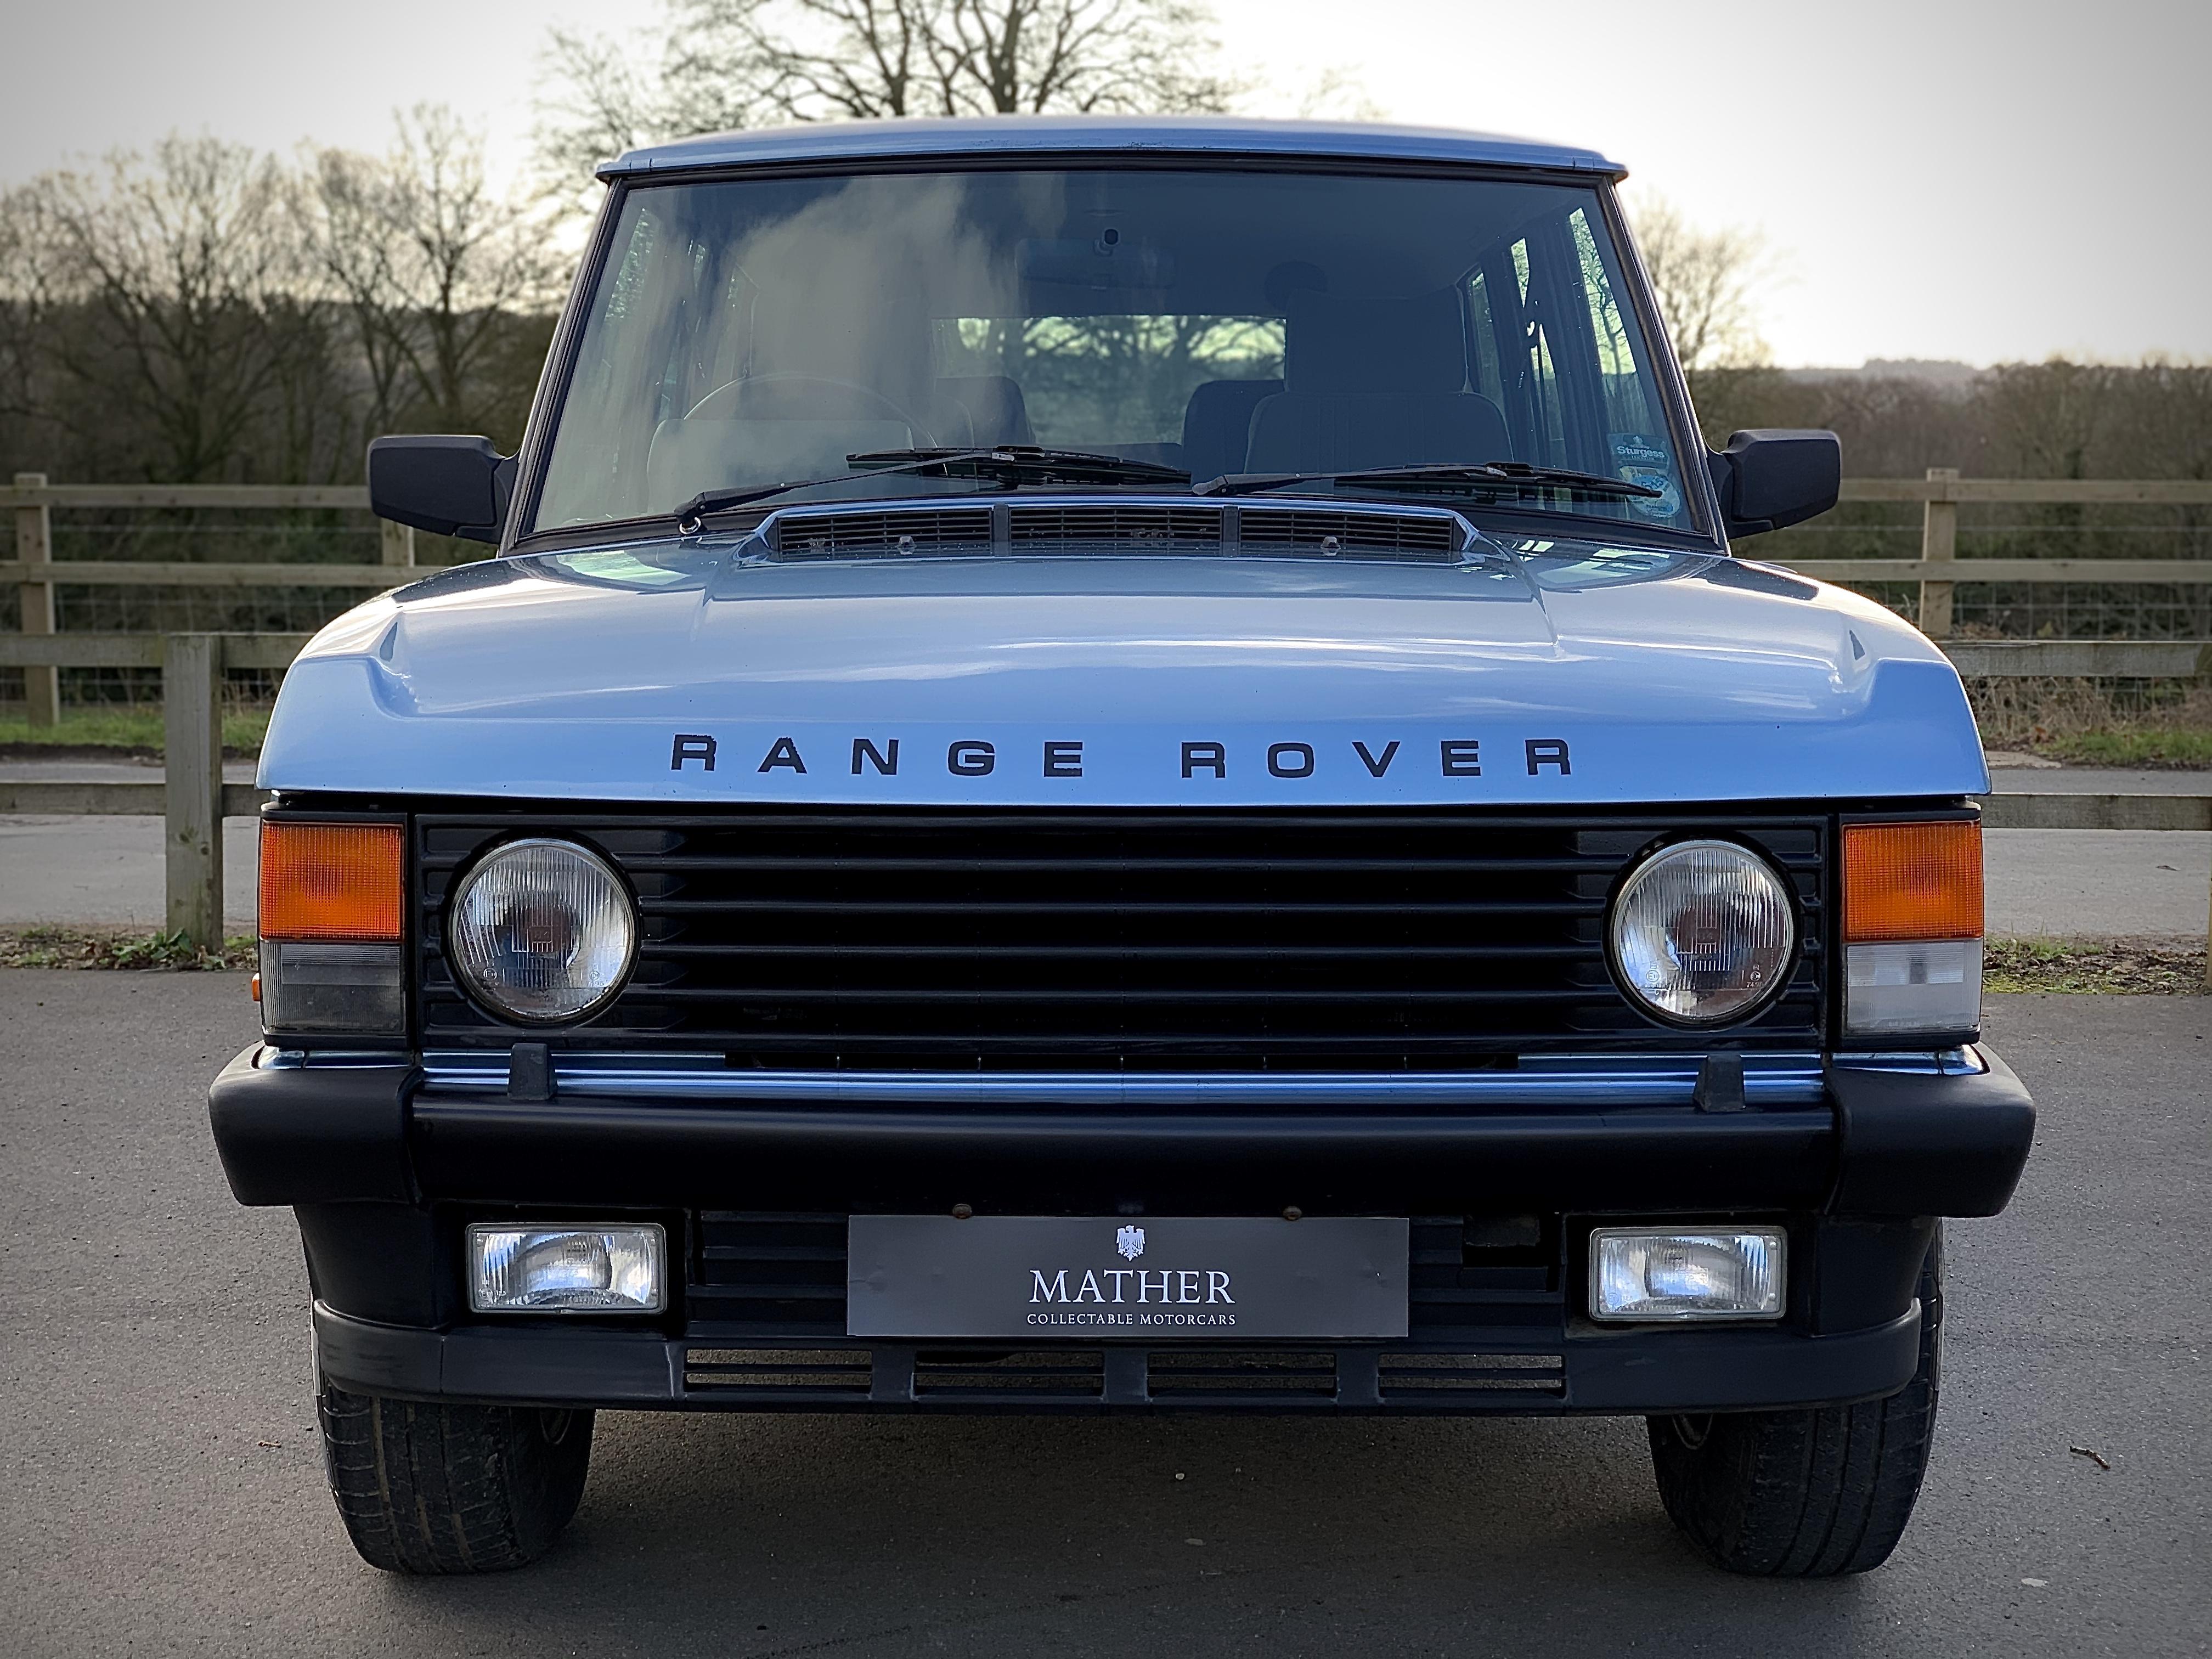 1989 Range Rover 3.5 EFI